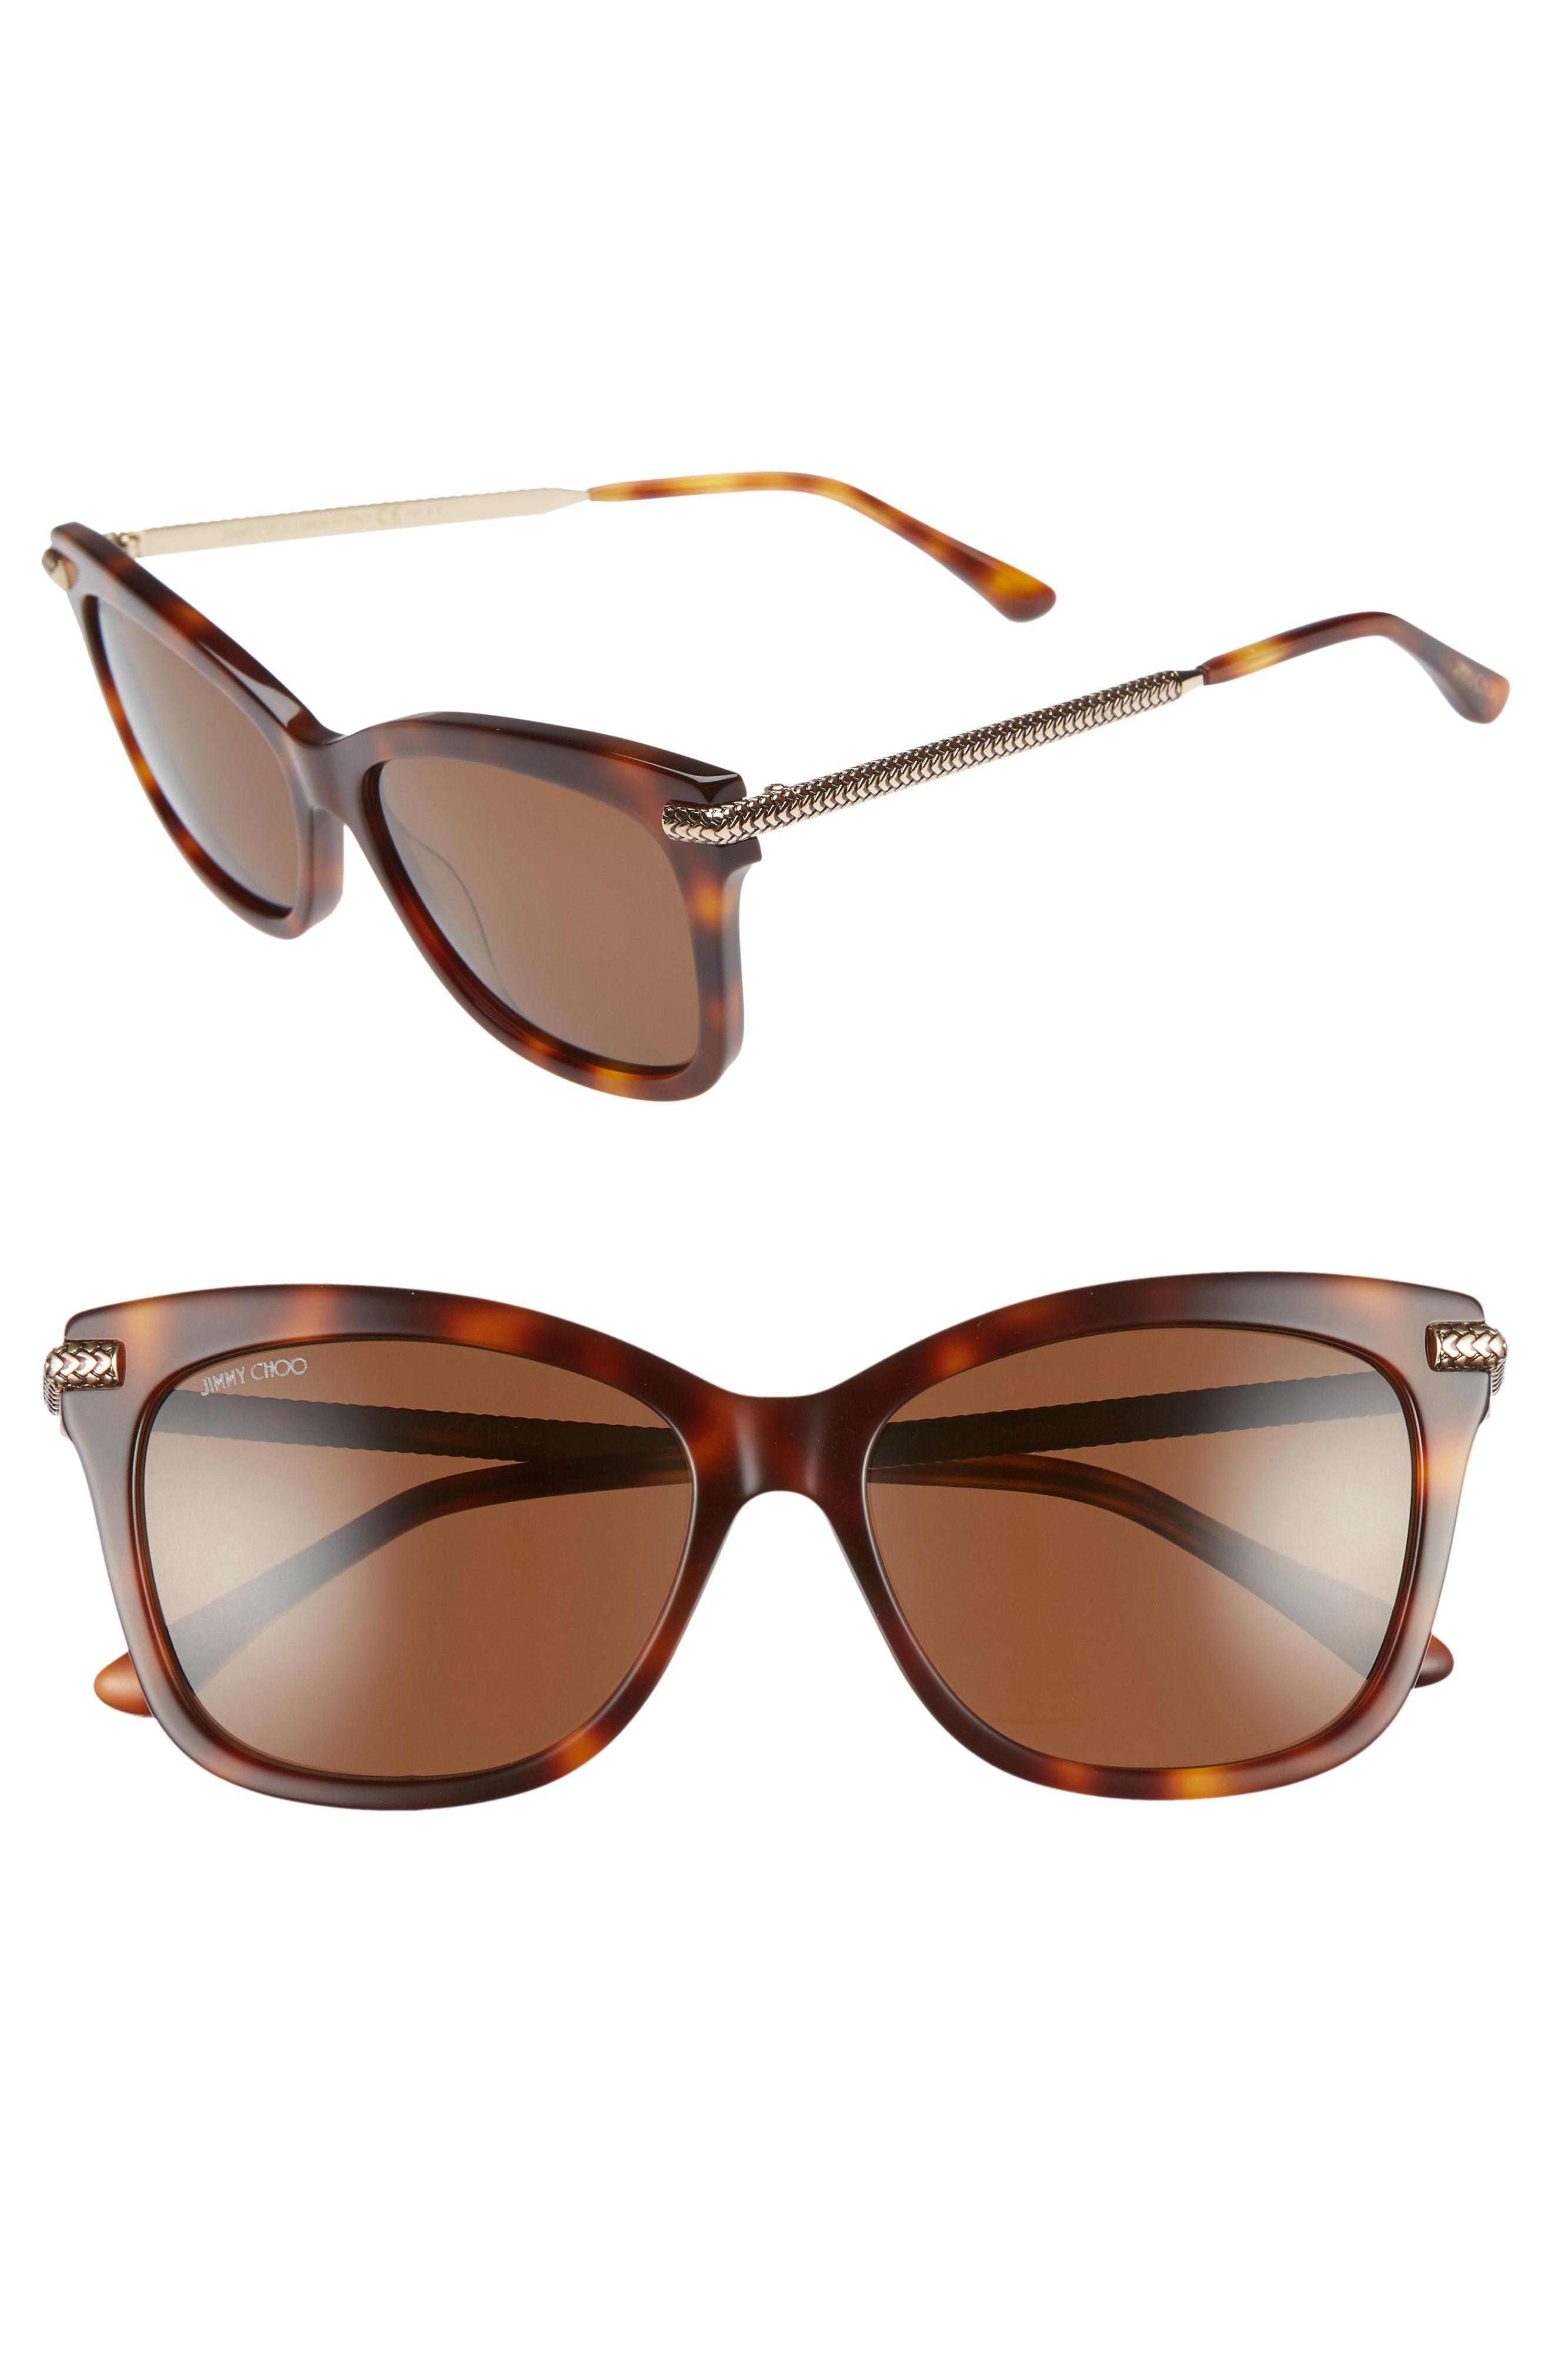 46d070124f3 Jimmy Choo - Brown Shade 55mm Cat Eye Sunglasses - - Lyst. View fullscreen